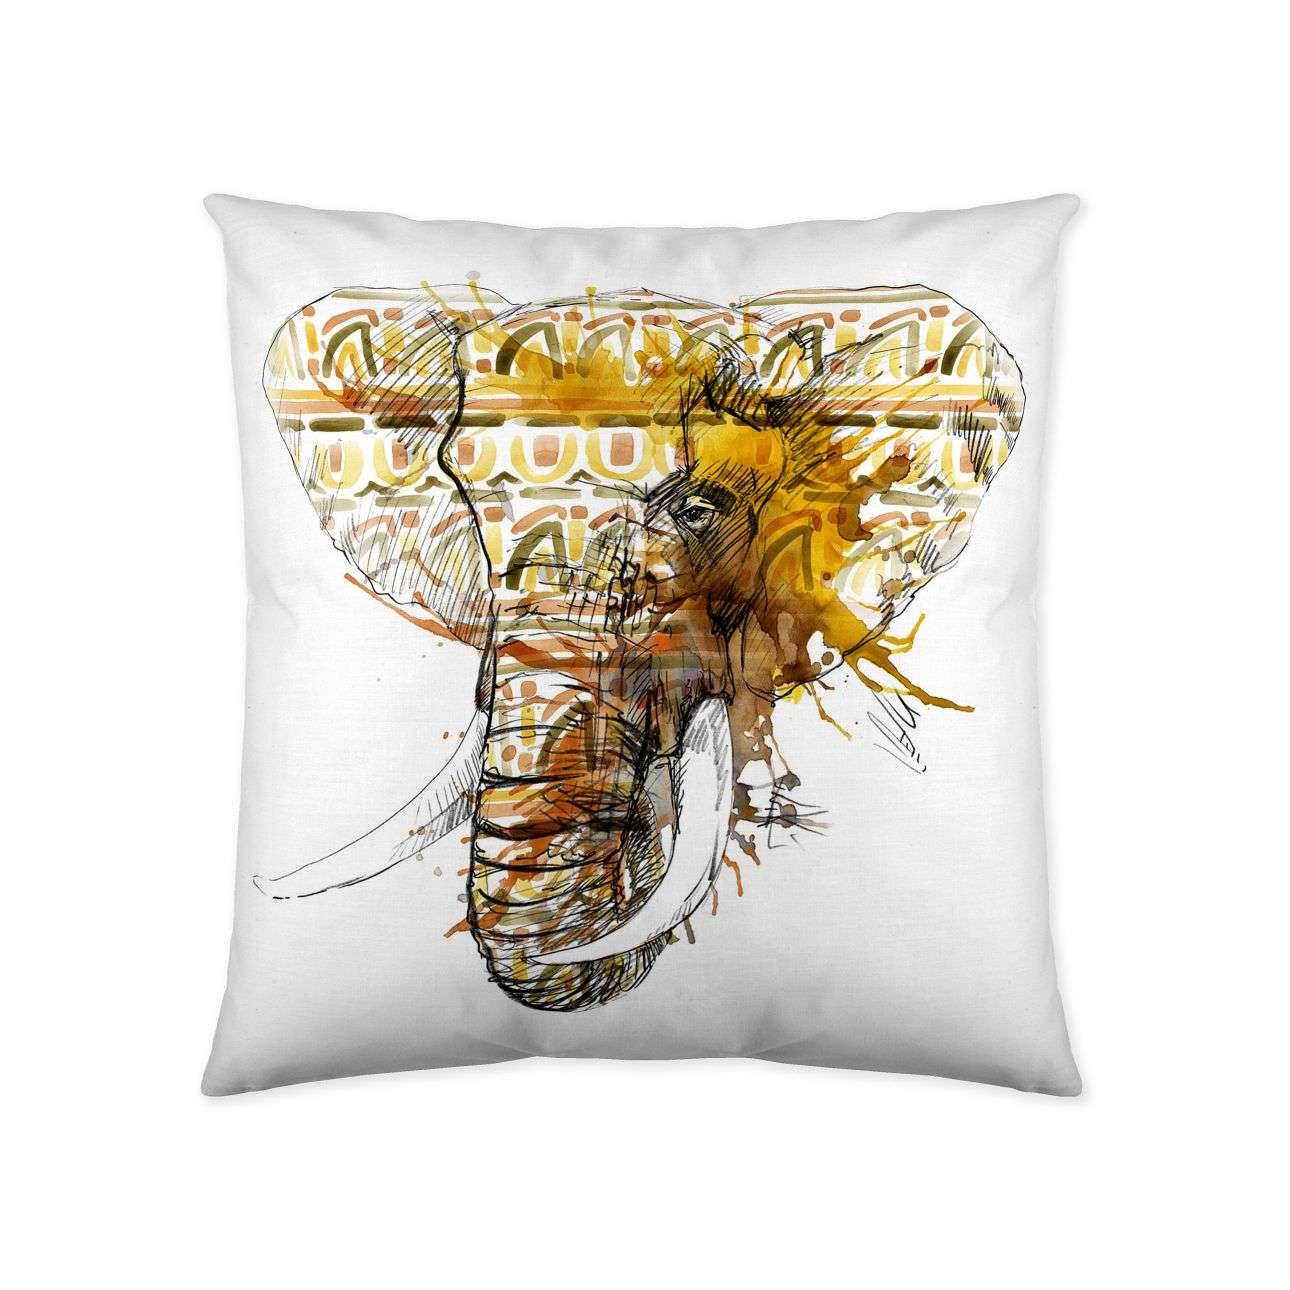 Potah  Elephant Head 45x45cm